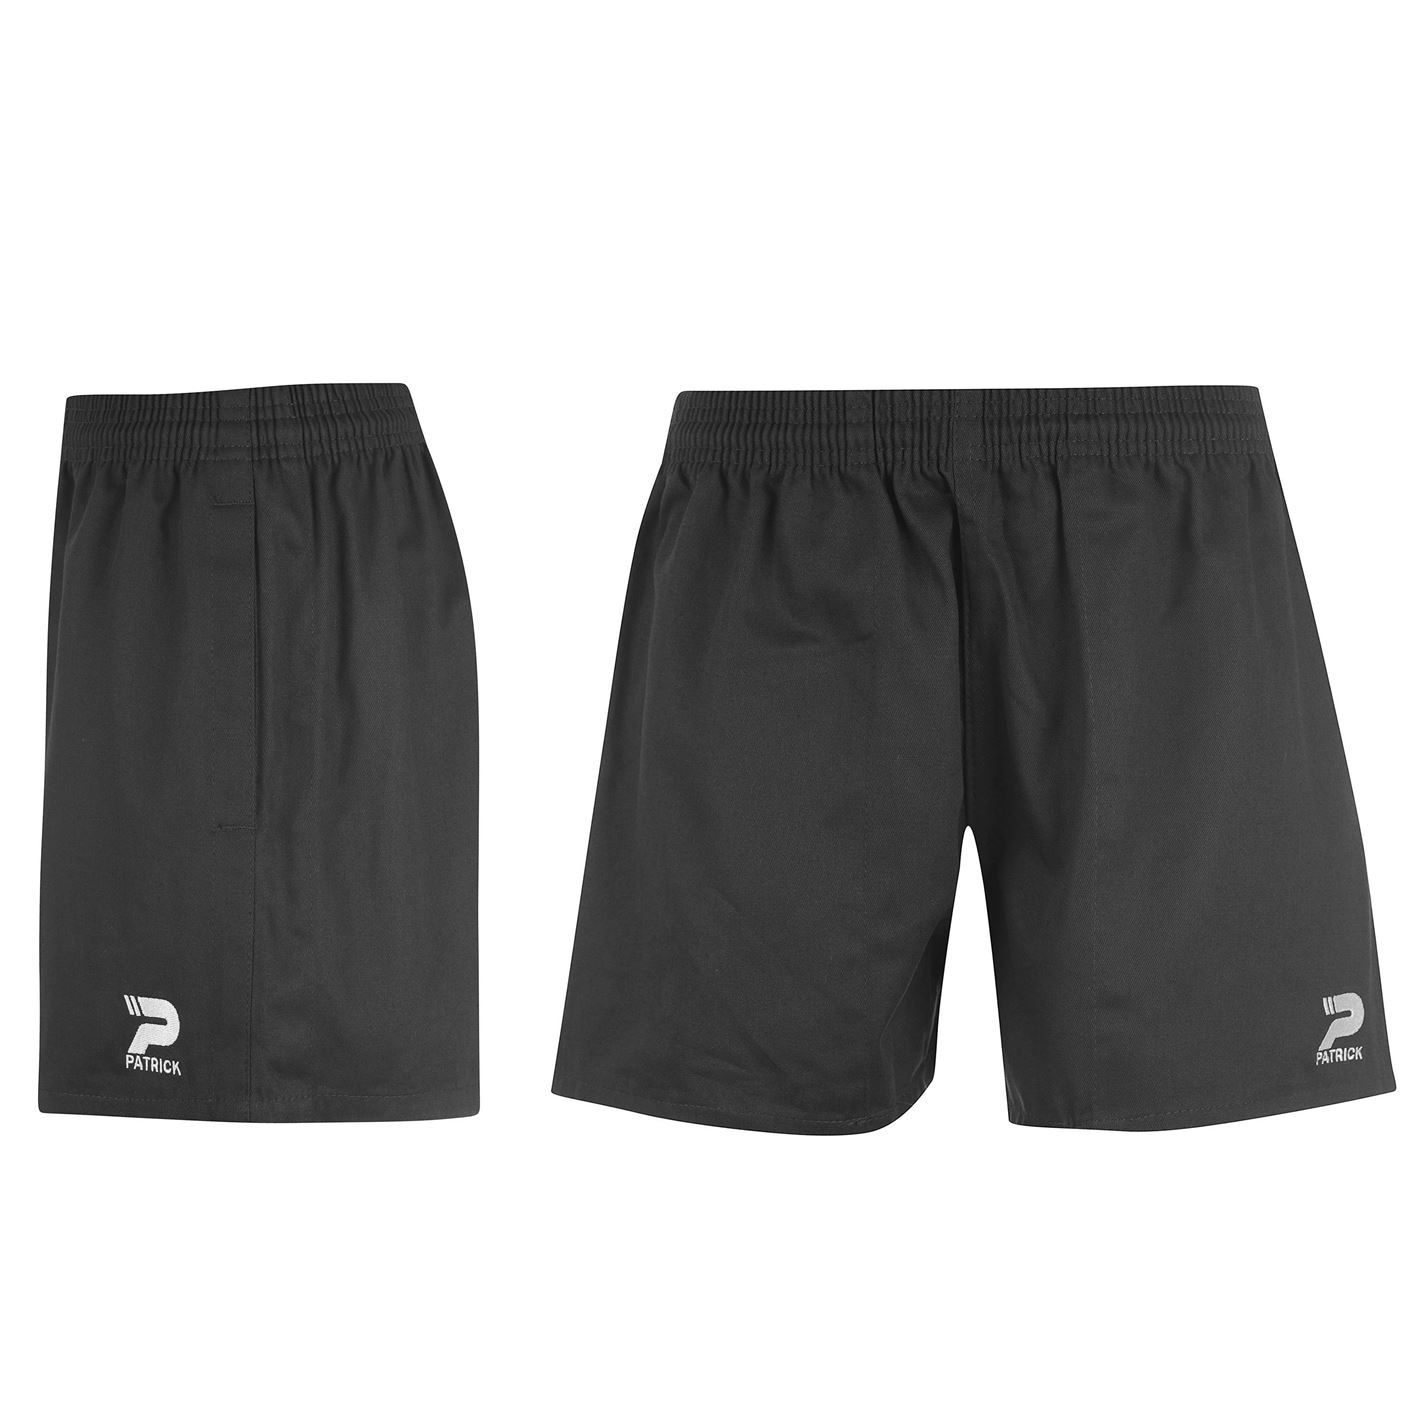 Patrick-Rugby-Shorts-Junior-Boys-Sports-Fan-Bottoms thumbnail 3